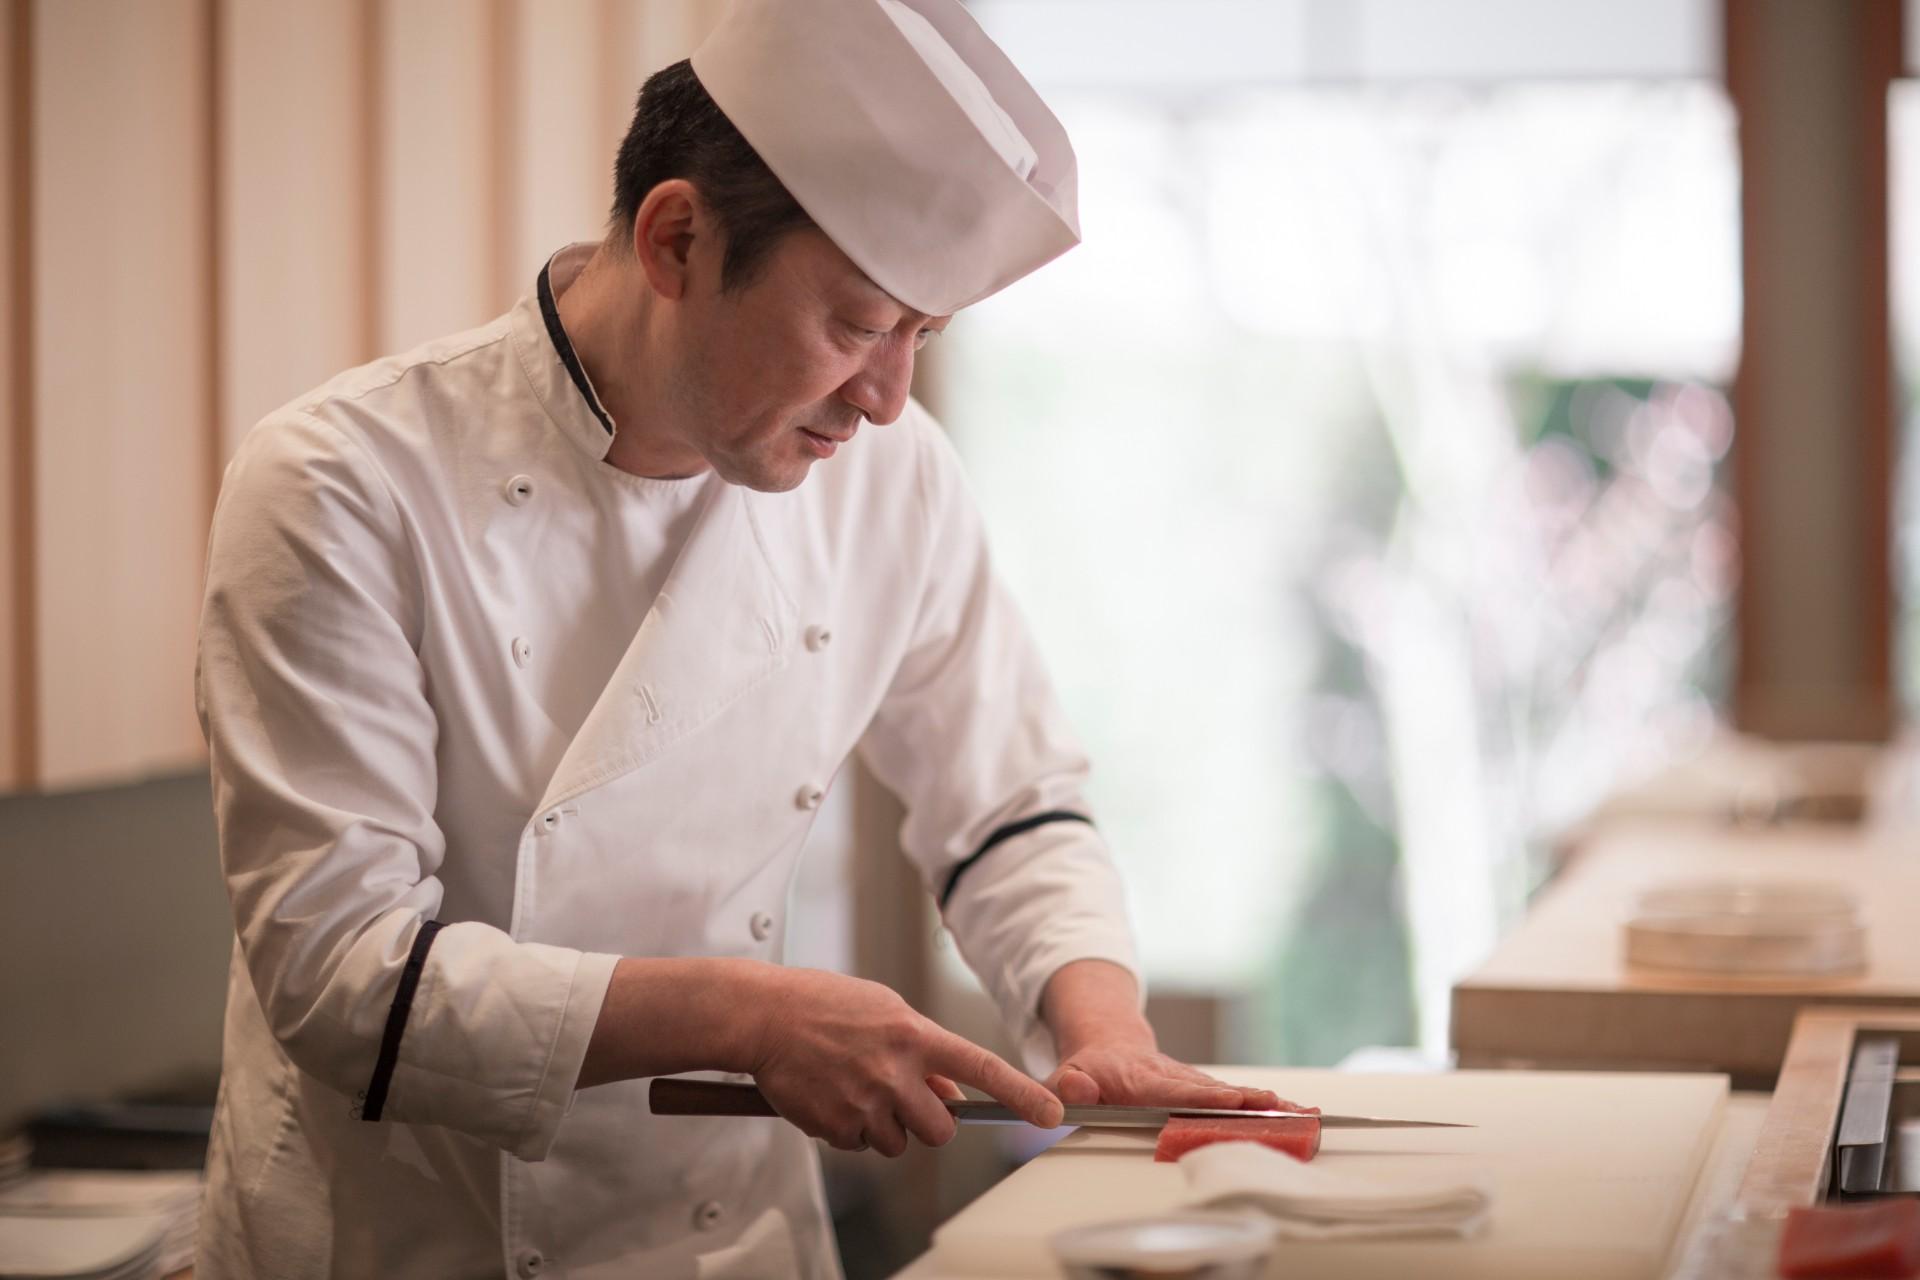 Chef Masanori Tomikawa